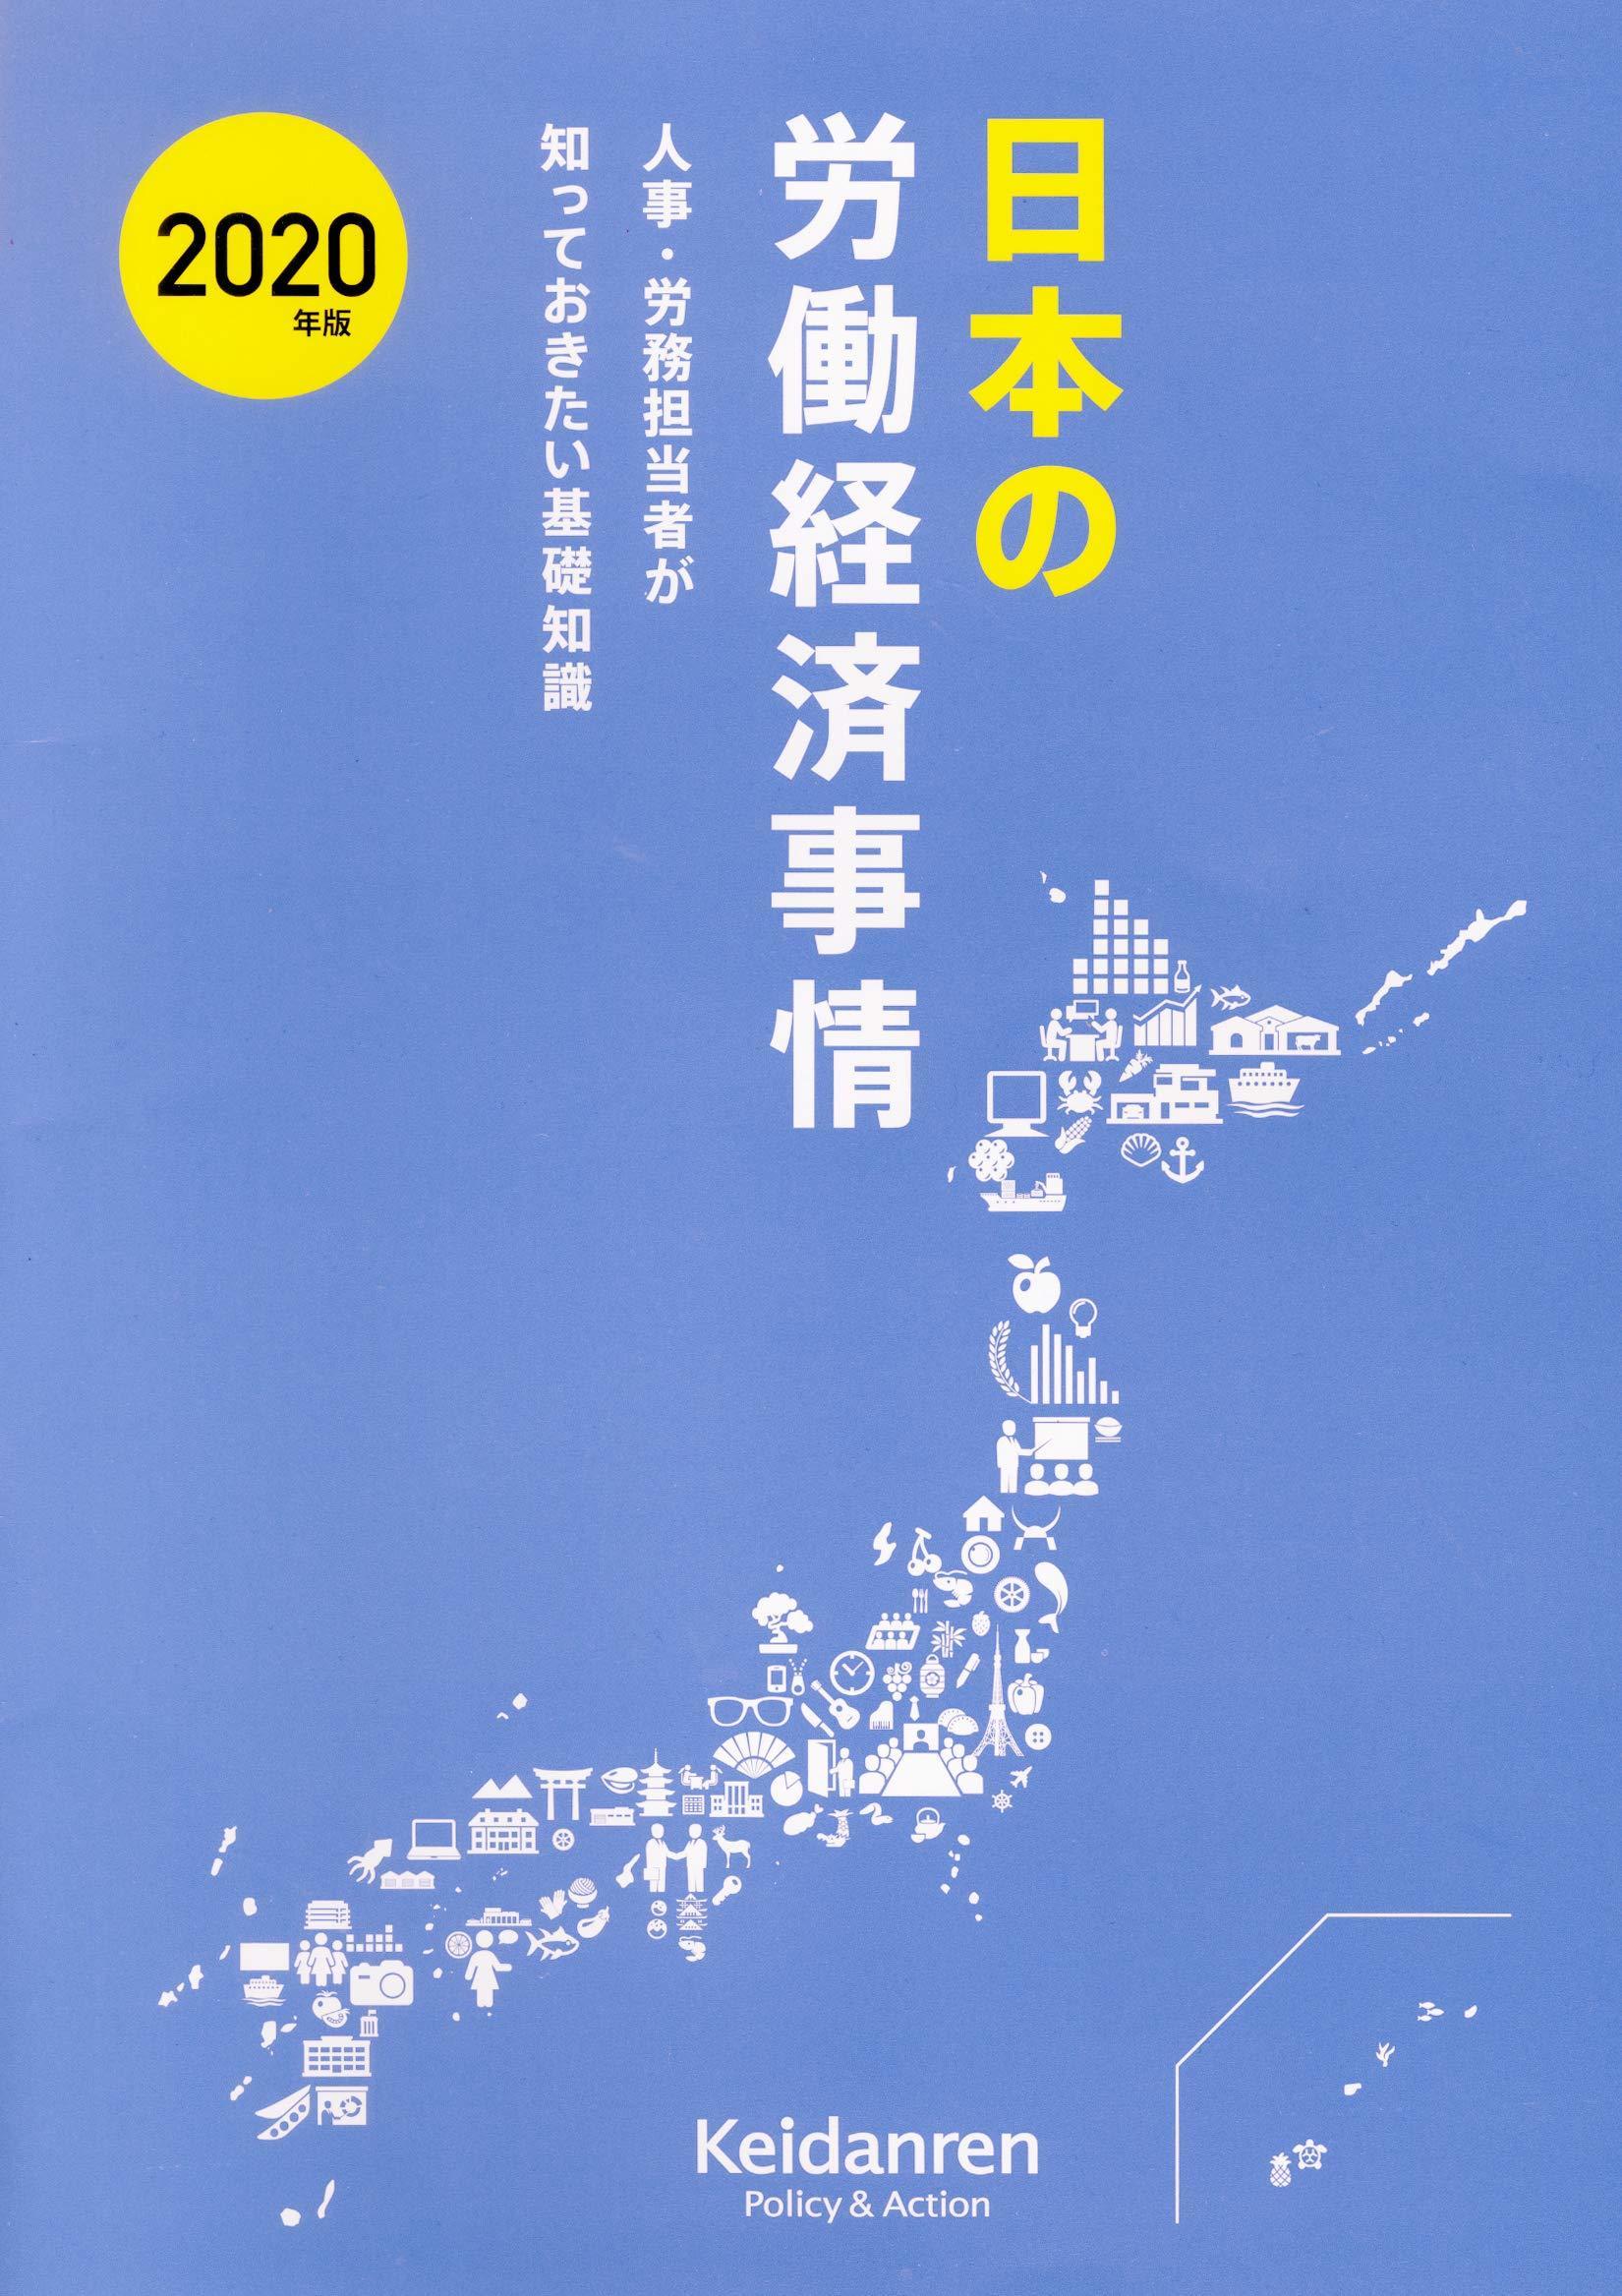 https://blogs.itmedia.co.jp/akinori/bc0d316be46627b6c10105cc222a320126342a5b.jpg